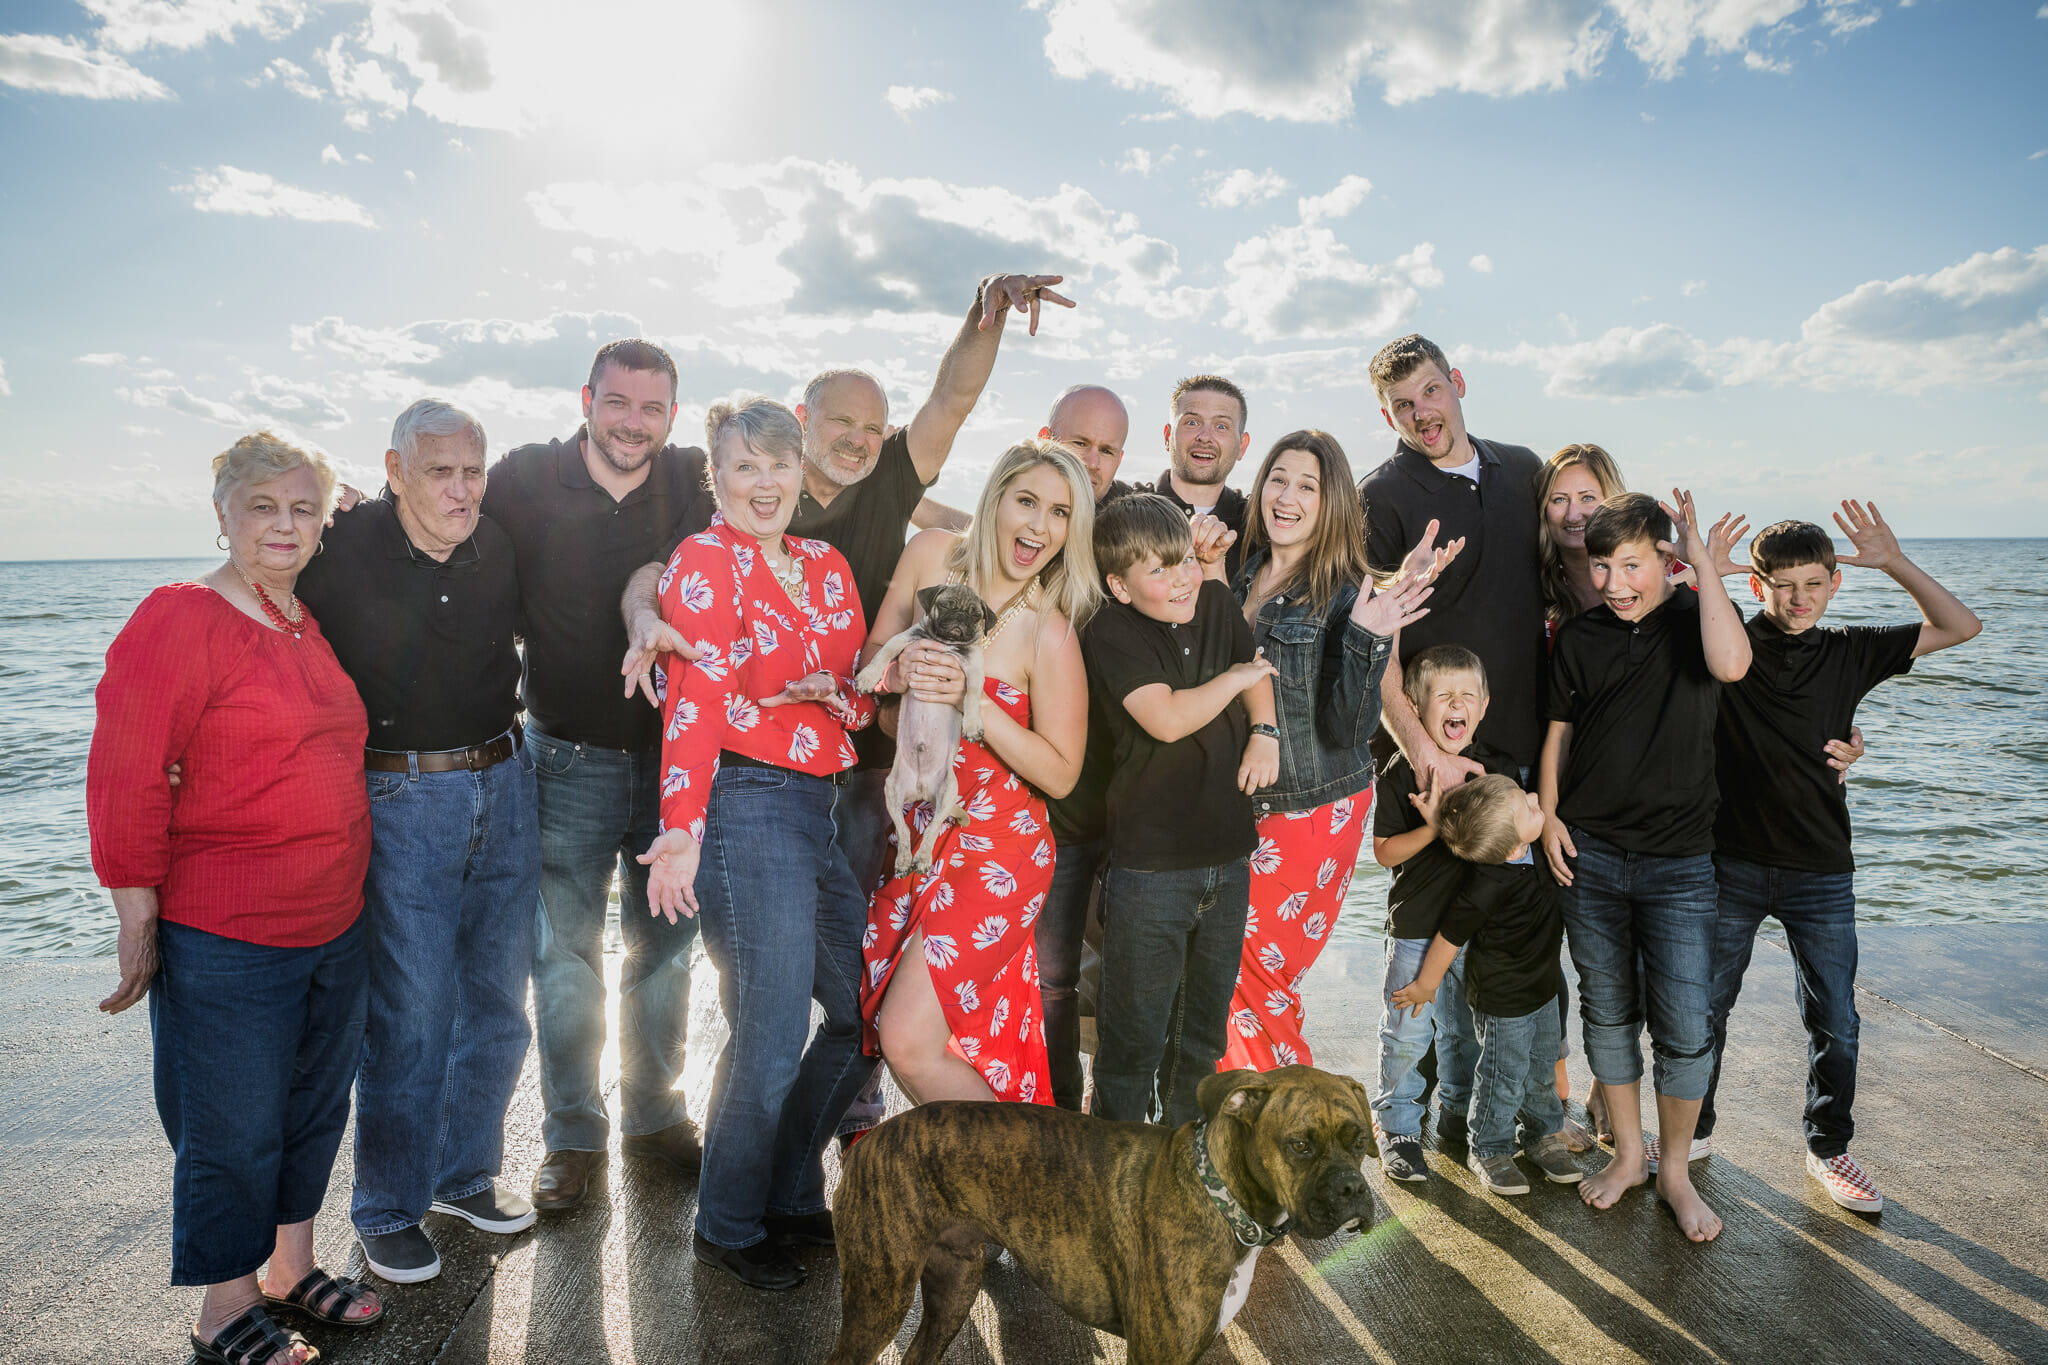 door county family photographer, family photography sessions, door county photographer, luke collins photography, wisconsin photographer, green bay photographer,